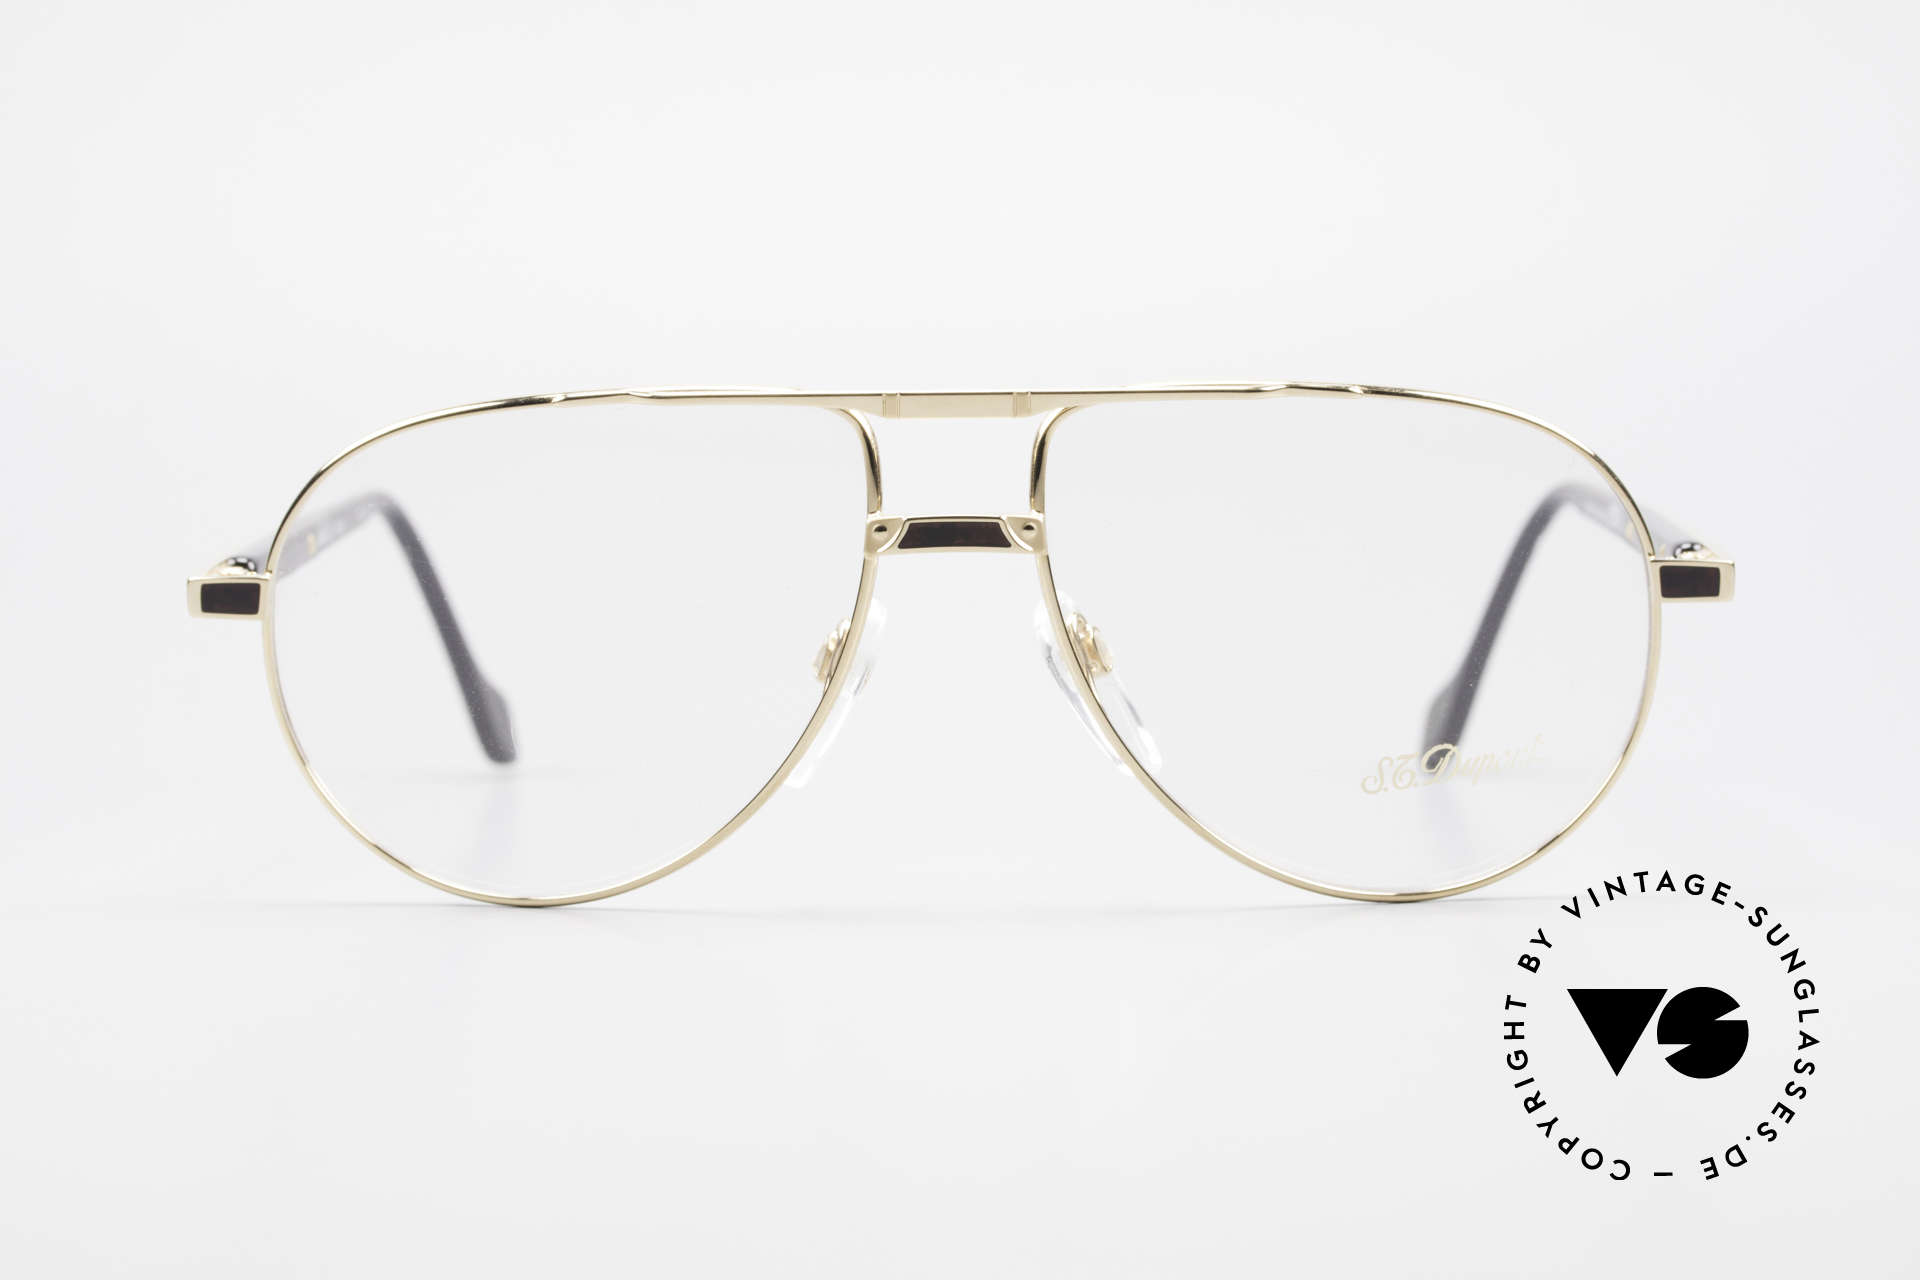 S.T. Dupont D023 Luxury Aviator Frame For Men, top craftsmanship (all Dupont frames are gold-plated), Made for Men